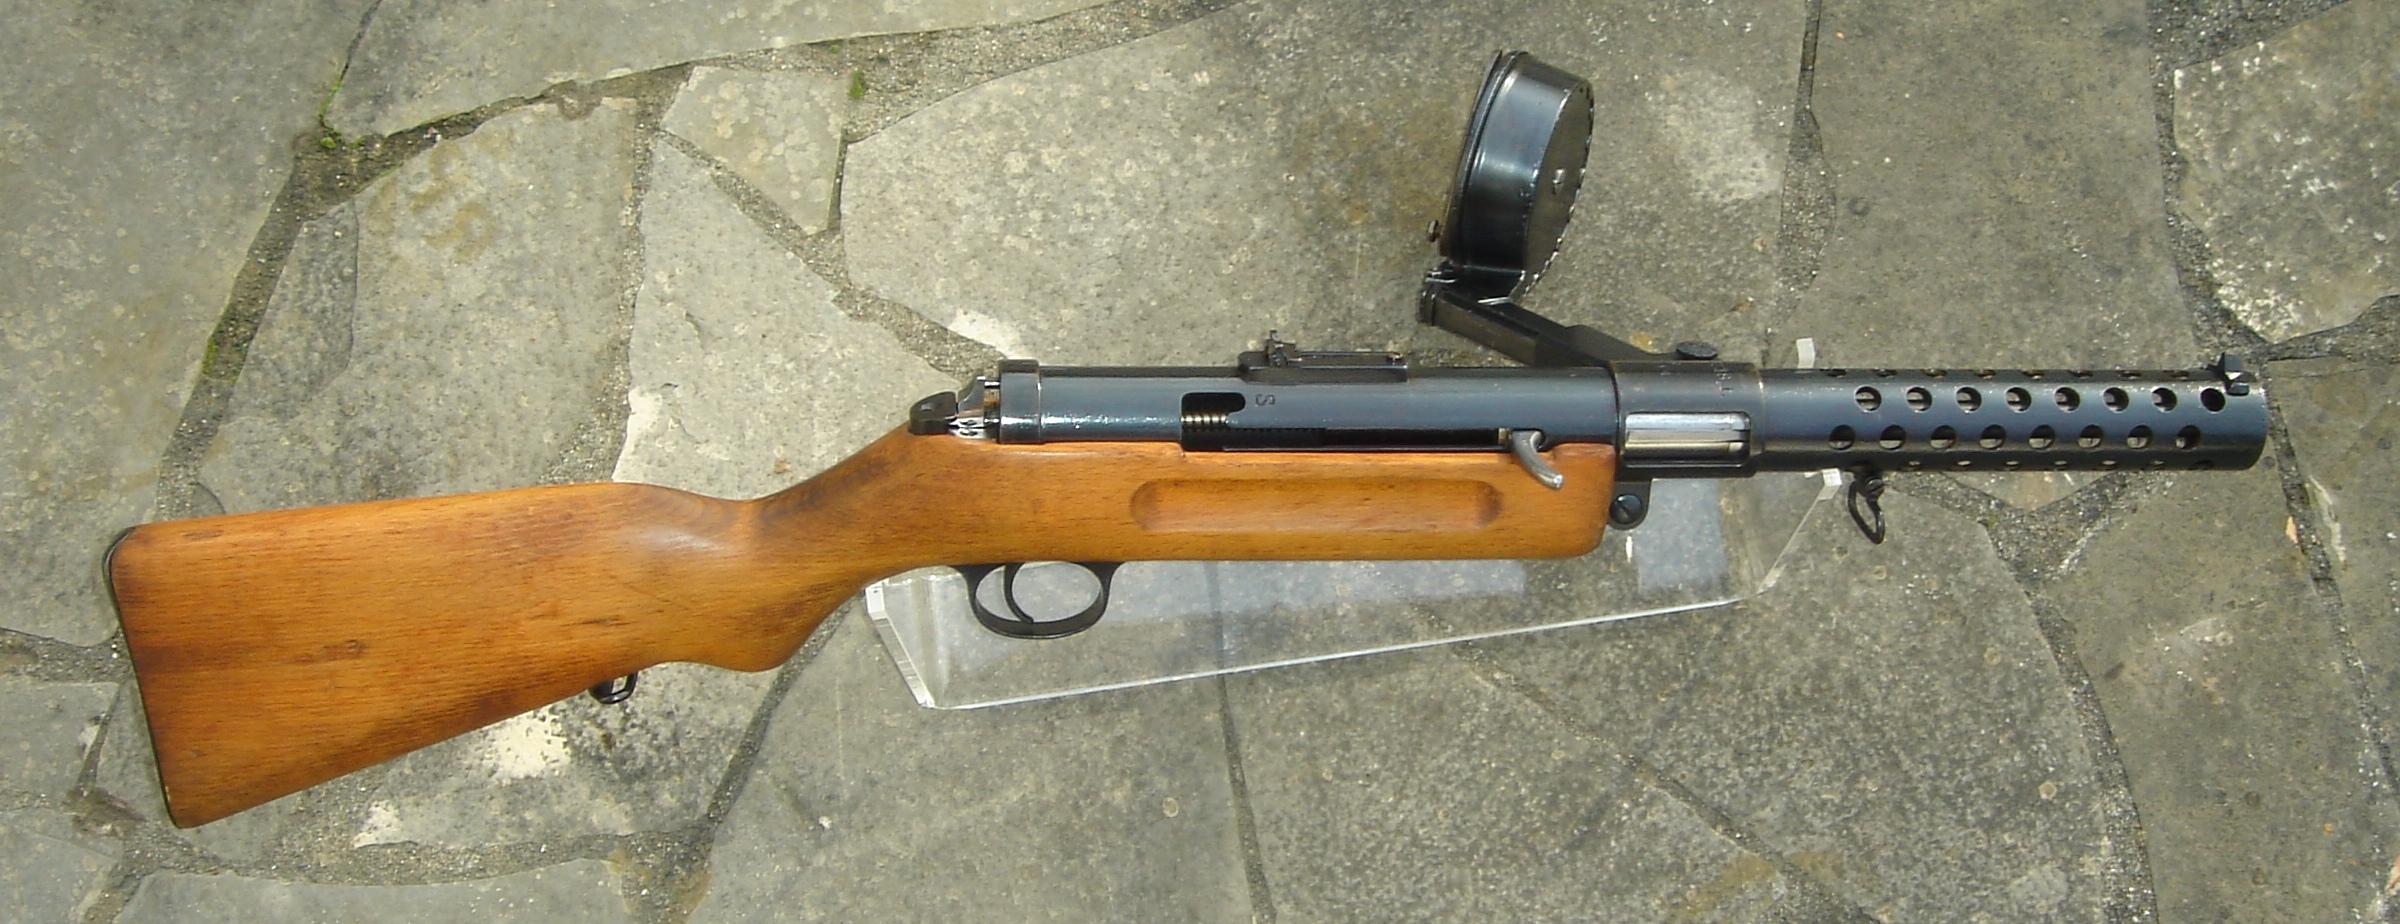 ww1 sub machine gun